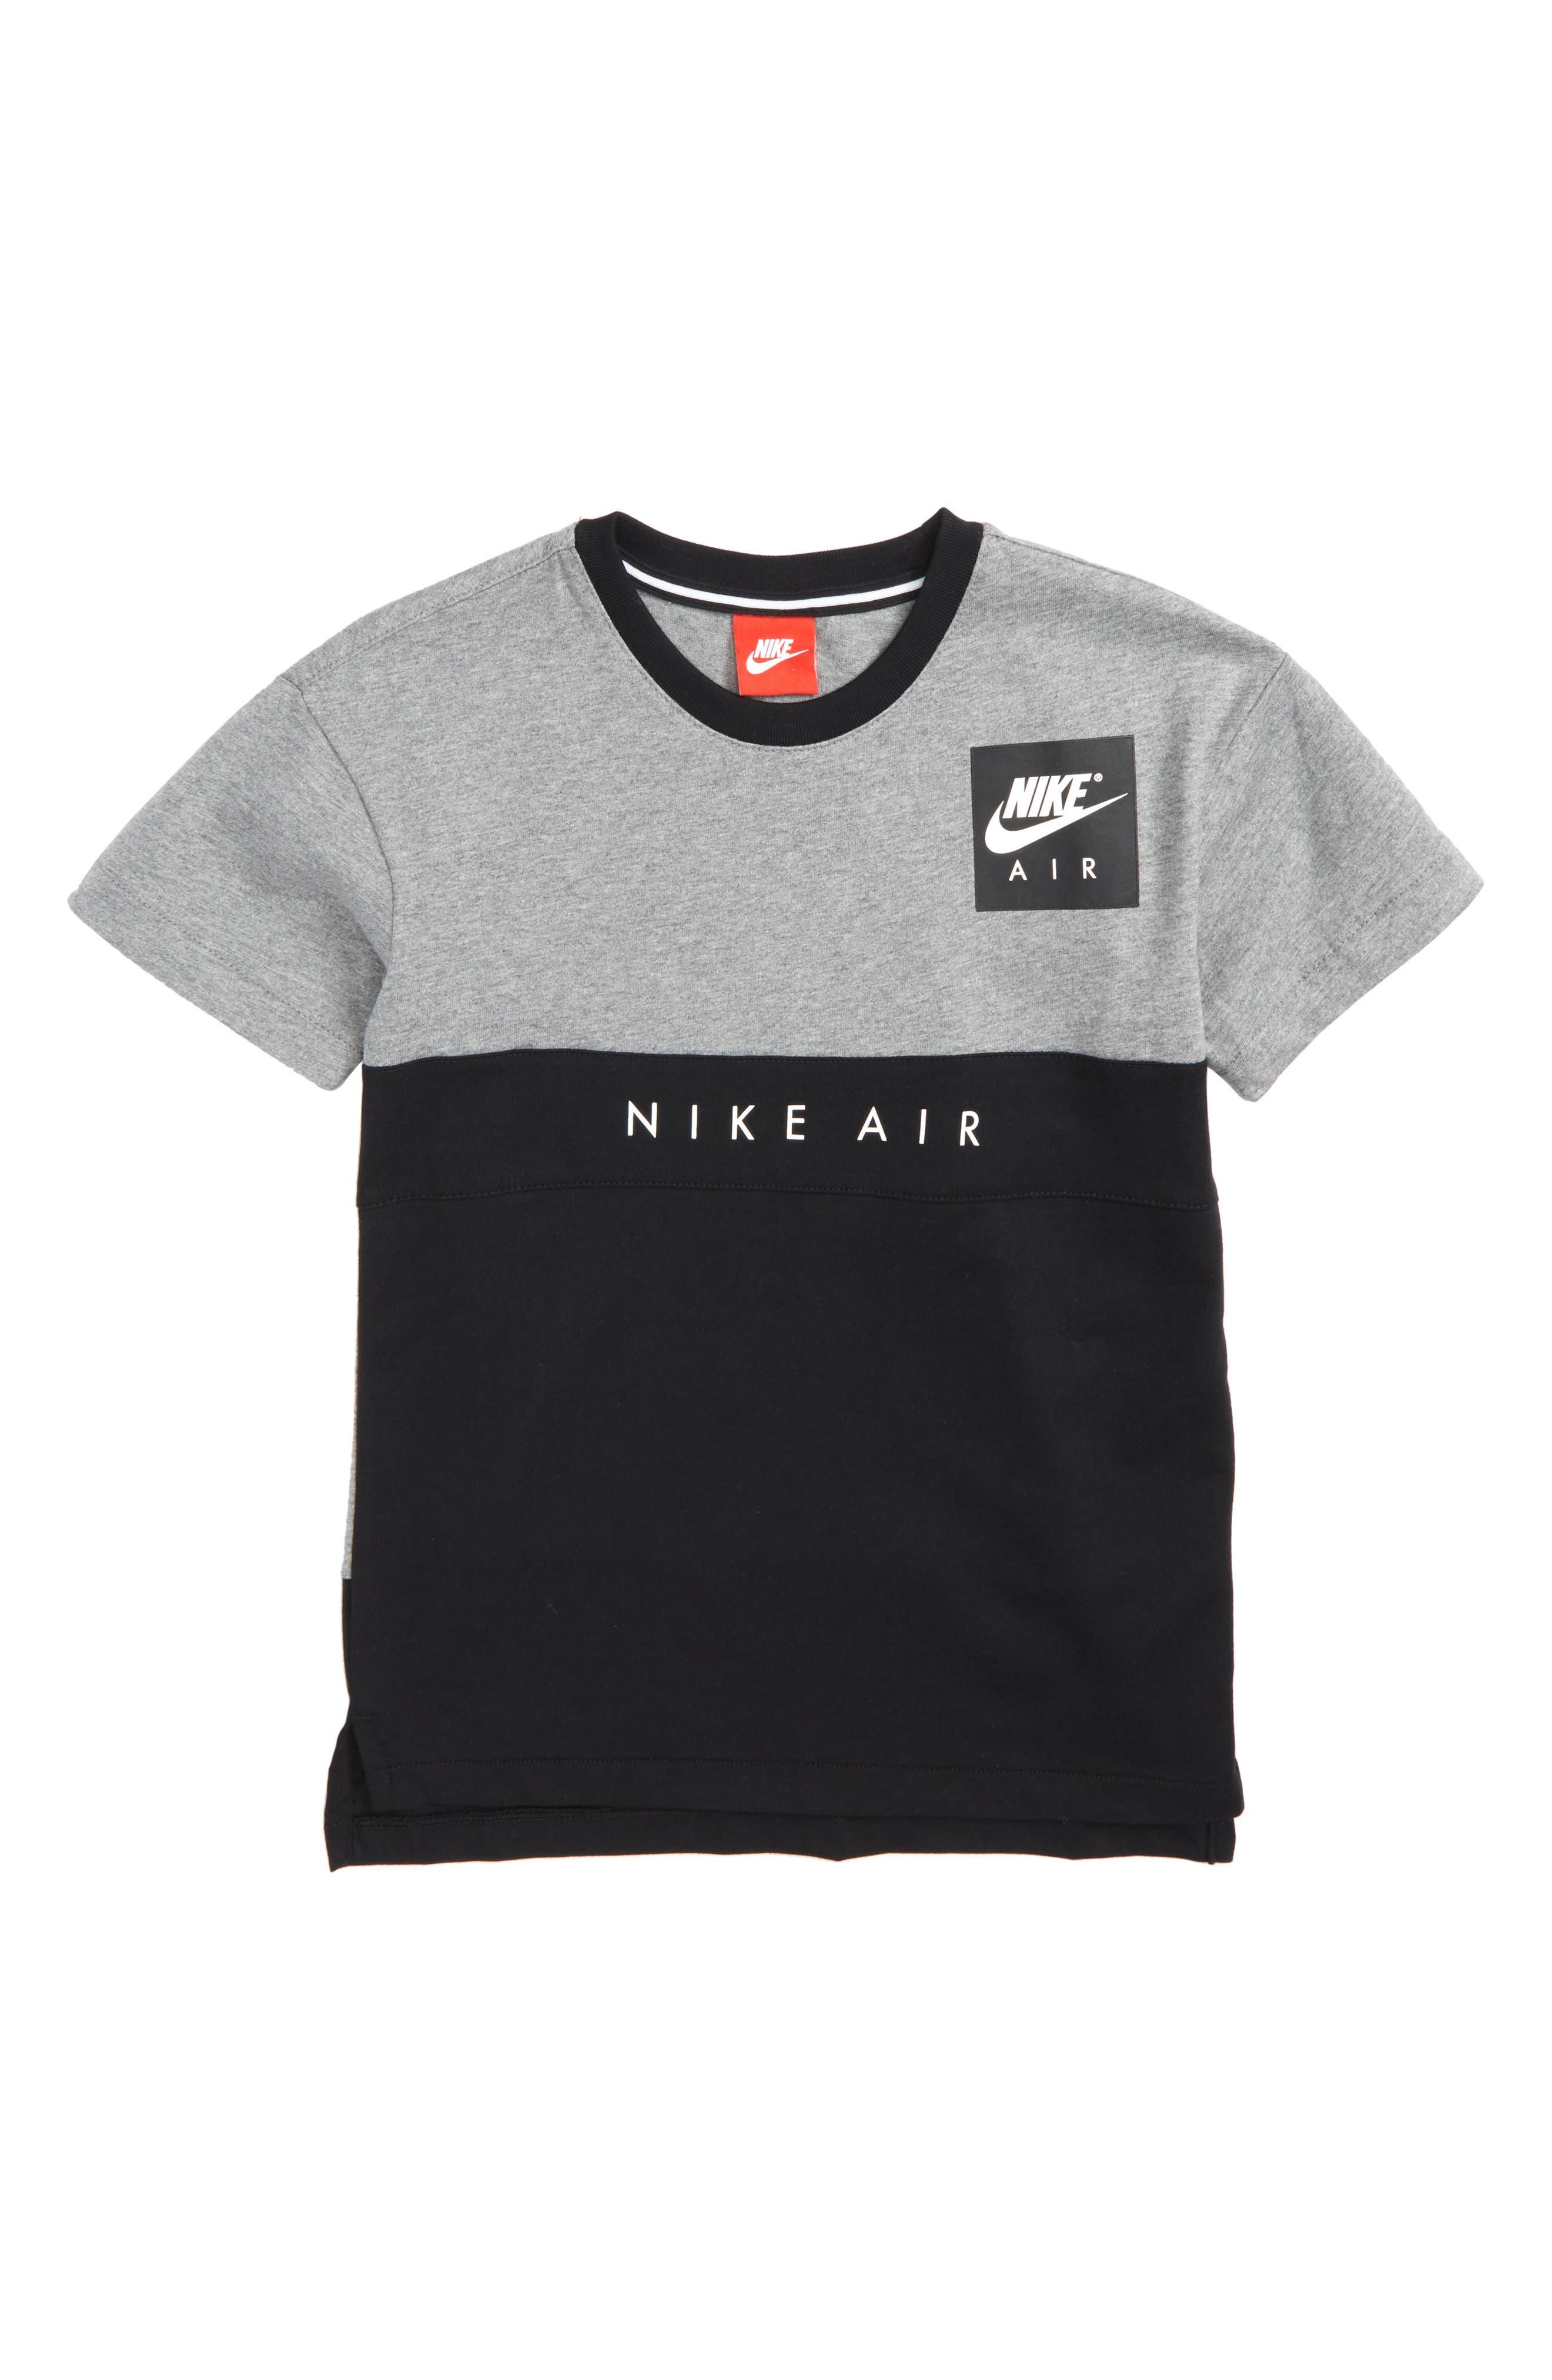 Air Shirt,                             Main thumbnail 1, color,                             Carbon Heather/ Black